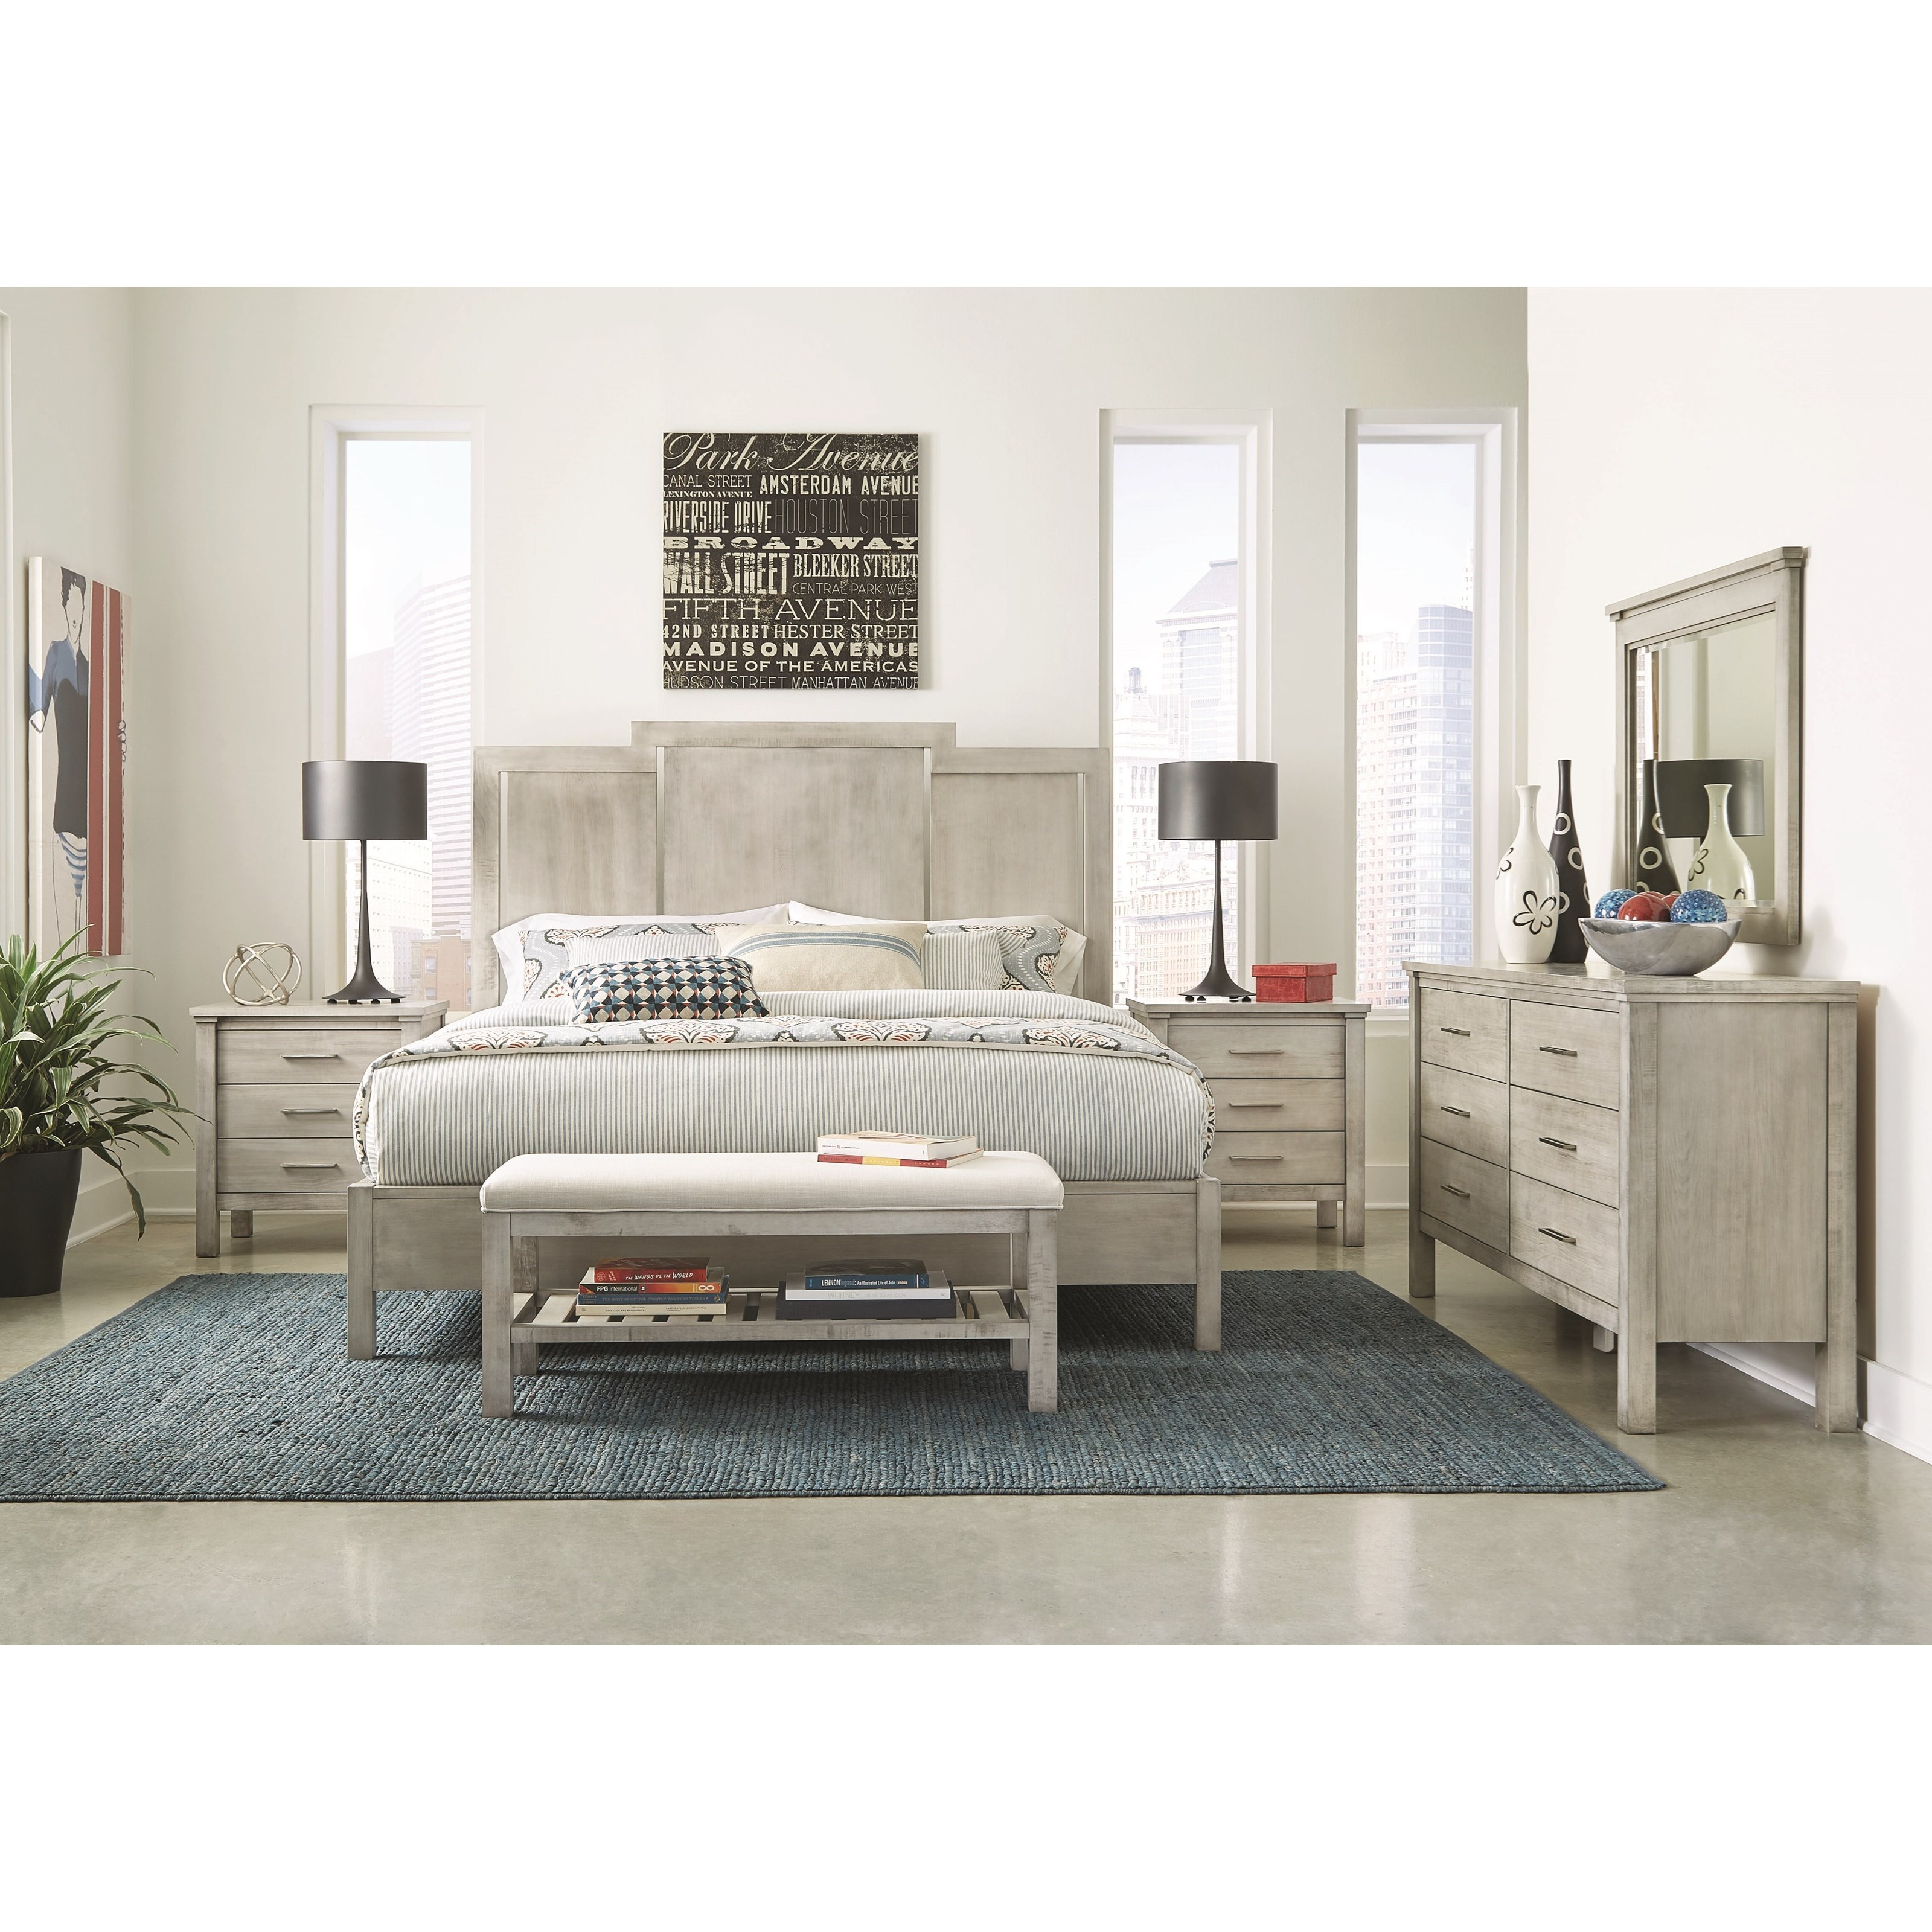 Studio 19 Queen Bedroom Group by Durham at Stoney Creek Furniture